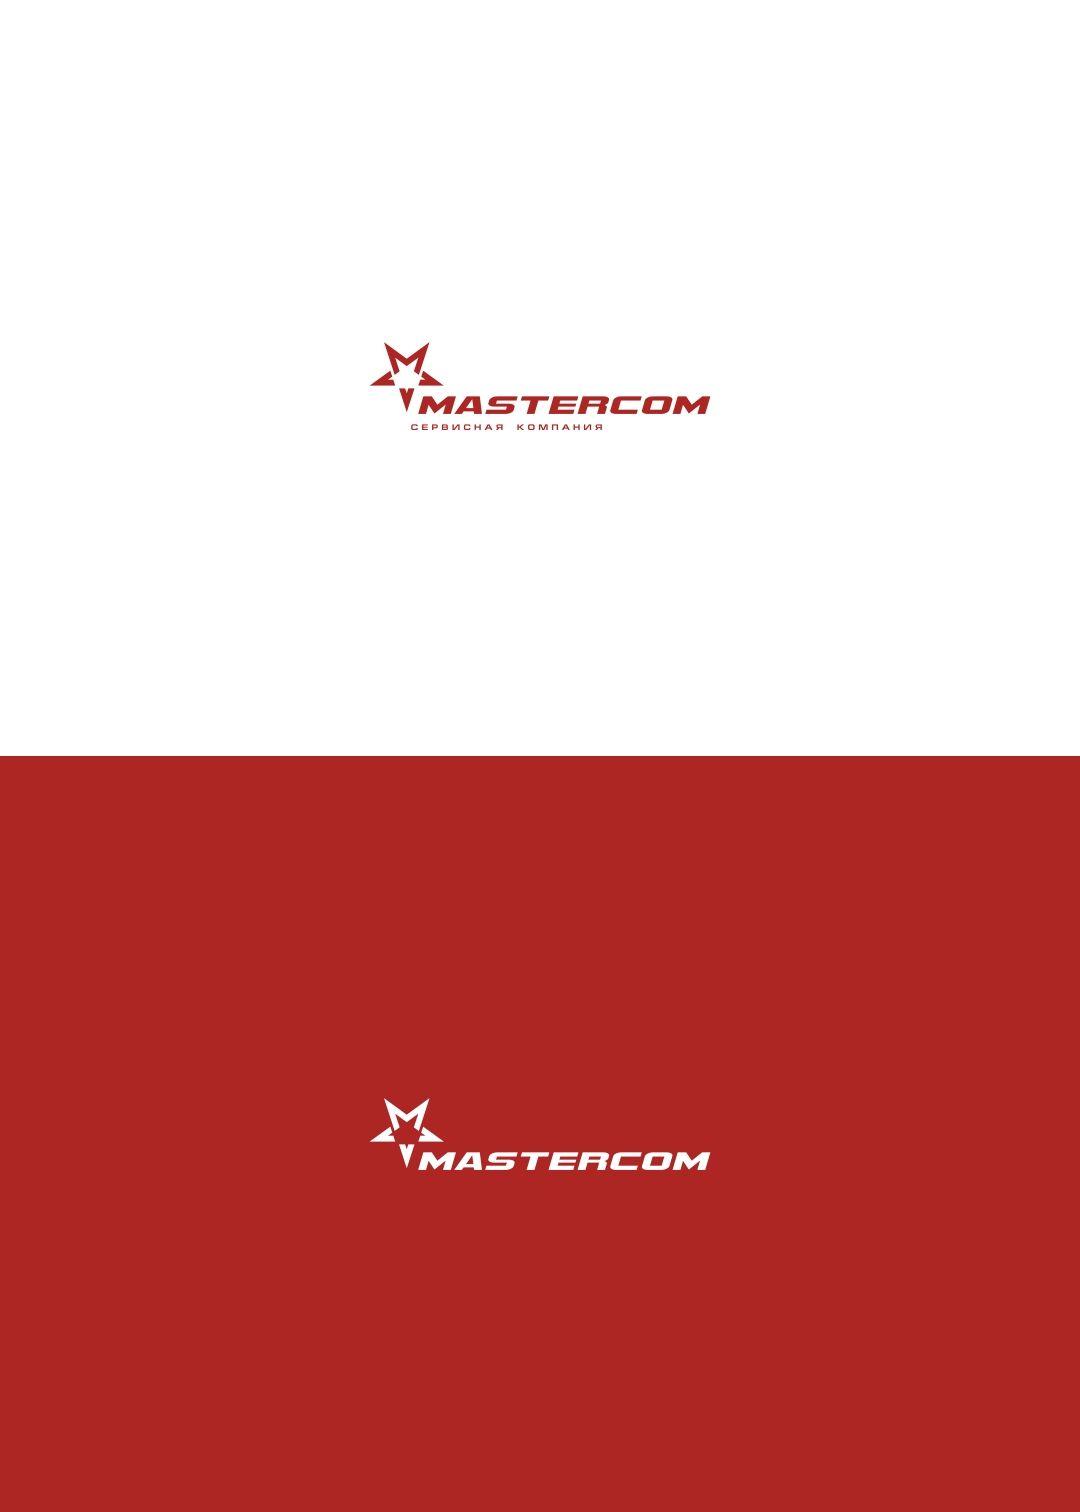 MasterCom (логотип, фирменный стиль) - дизайнер 4shark